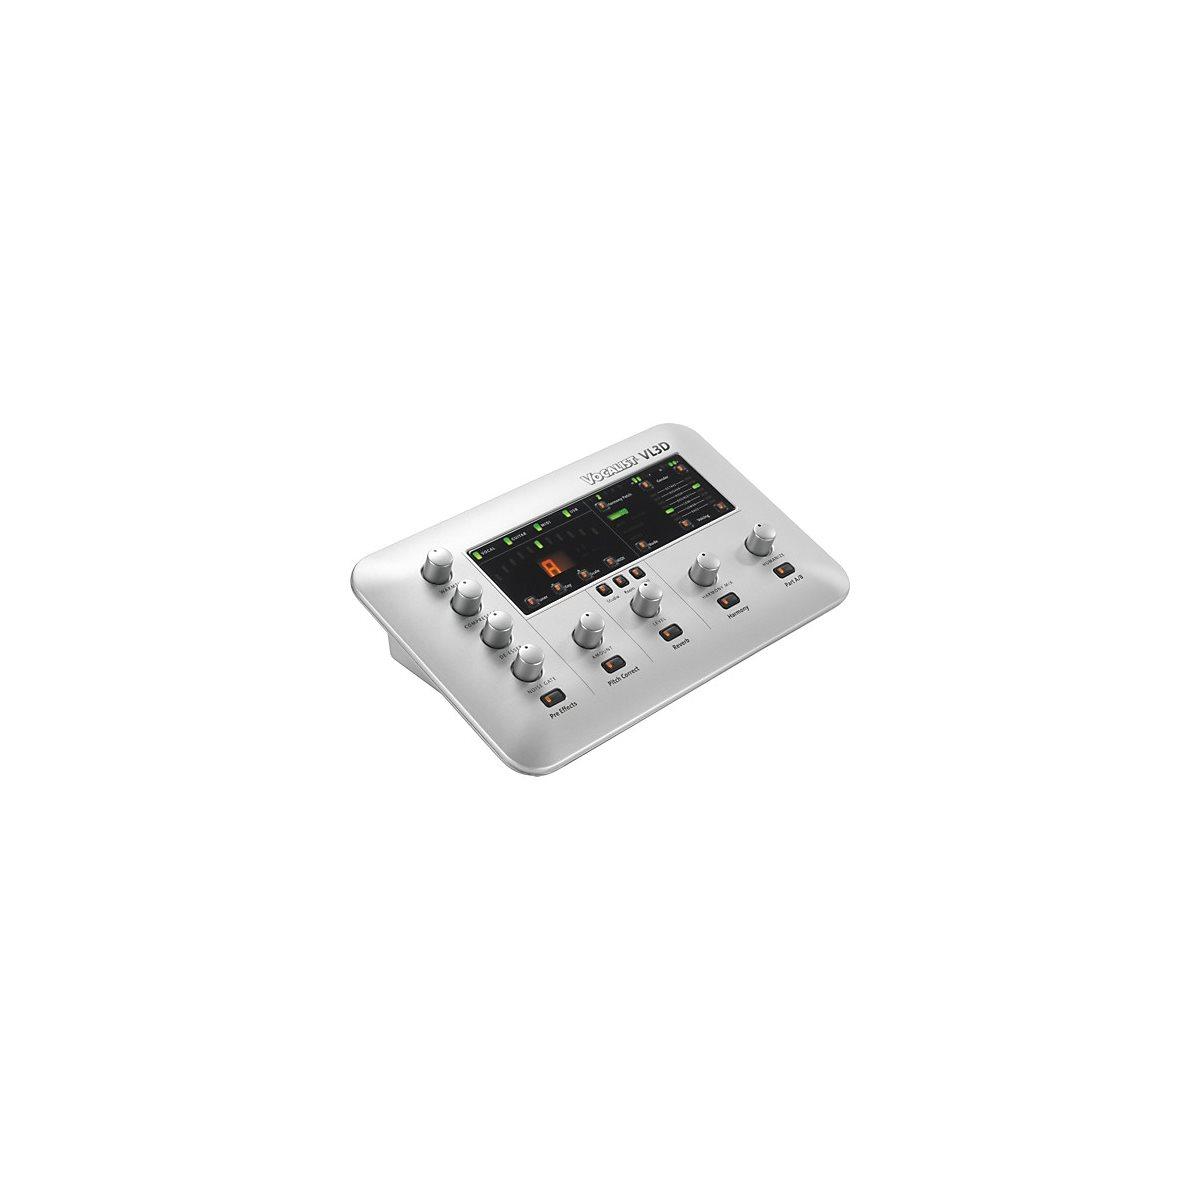 DIGITECH - VL3D - Desktop Vocal Harmony Processor